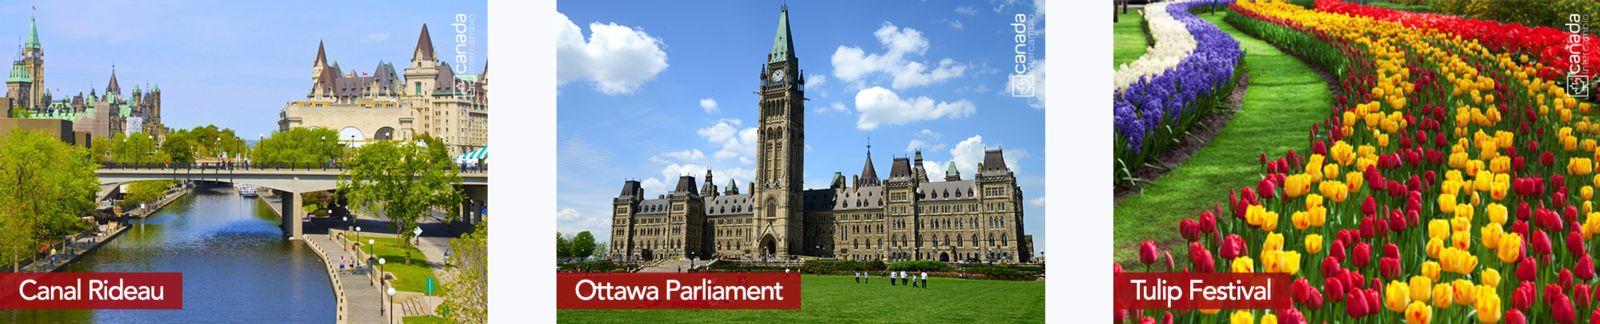 Turismo em Ottawa, Canada